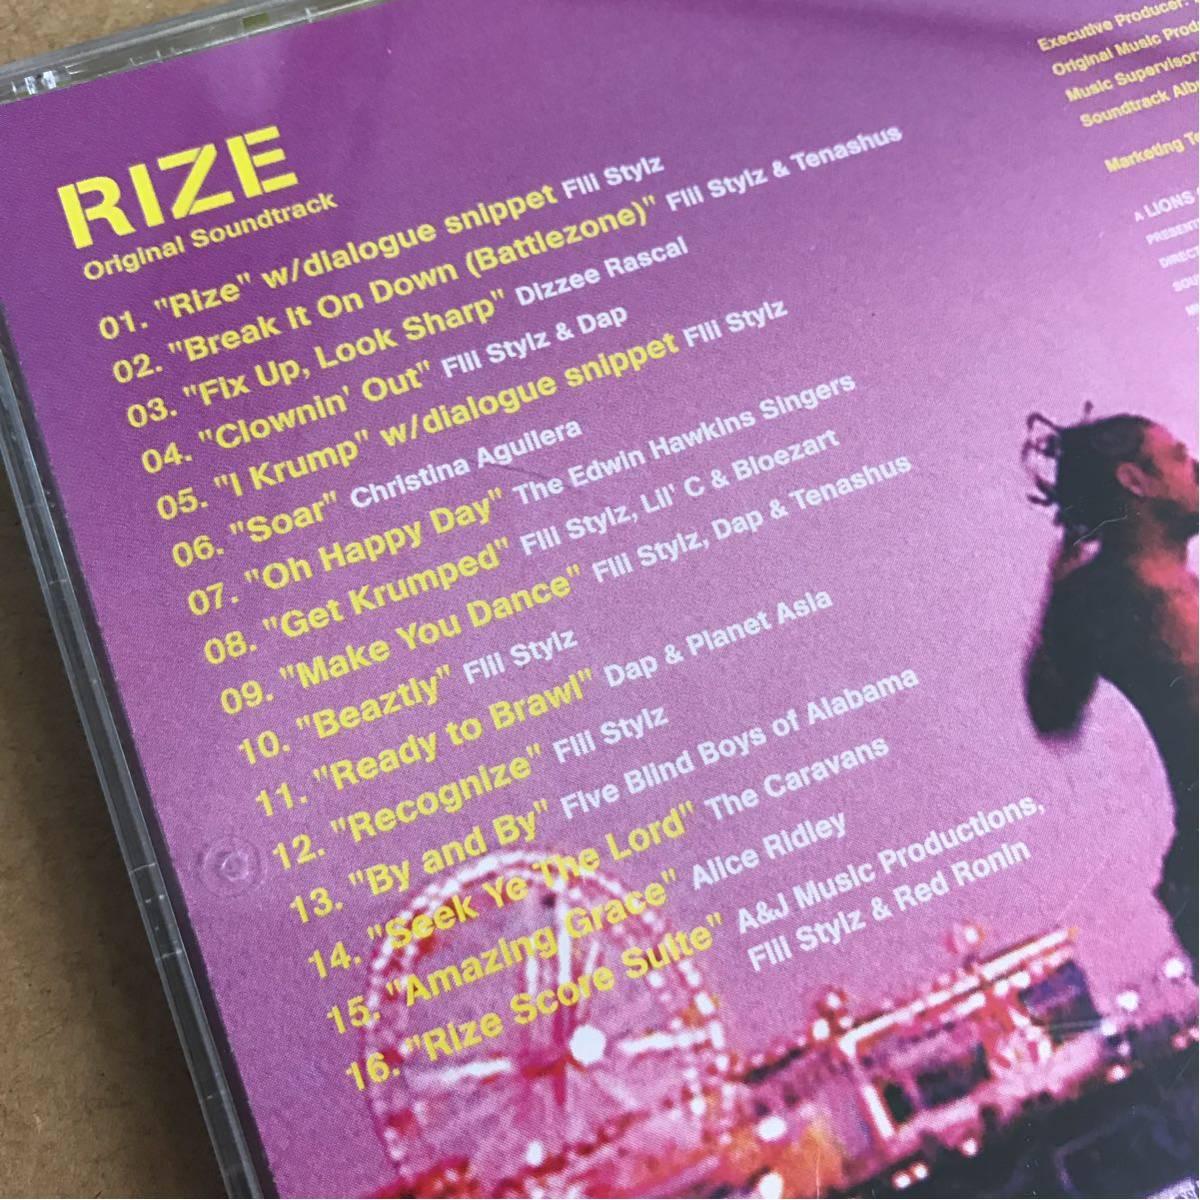 DVD付■RIZE オリジナルサウンドトラック■ニュー・ダンスのドキュメンタリー映画サントラ■Flii Stylz/Dizzee Rascal/Christina Aguilera_画像5